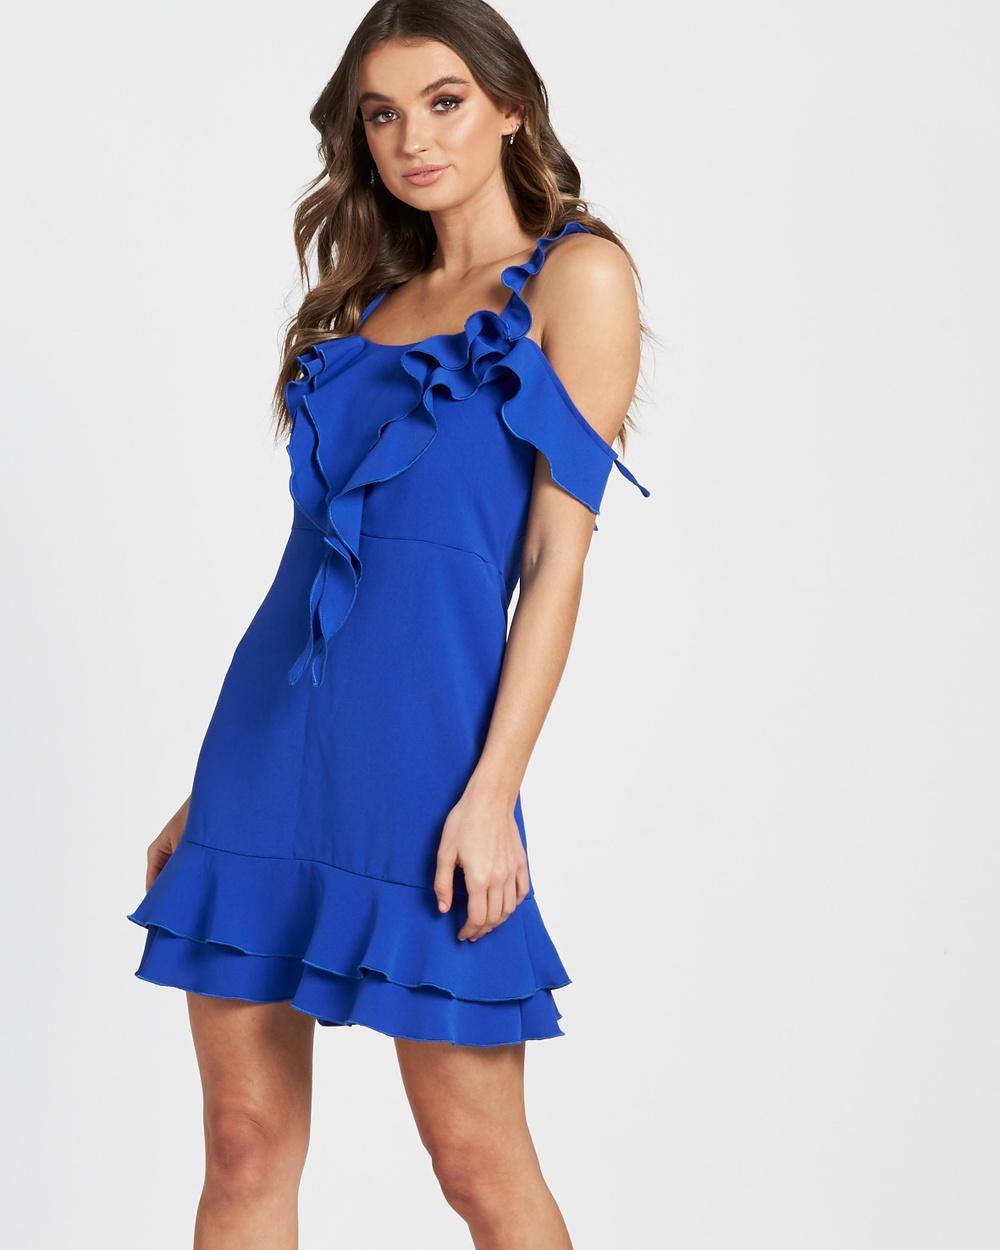 Lioness Pasadena Mini Dress Dresses Cobalt Blue Pasadena Mini Dress